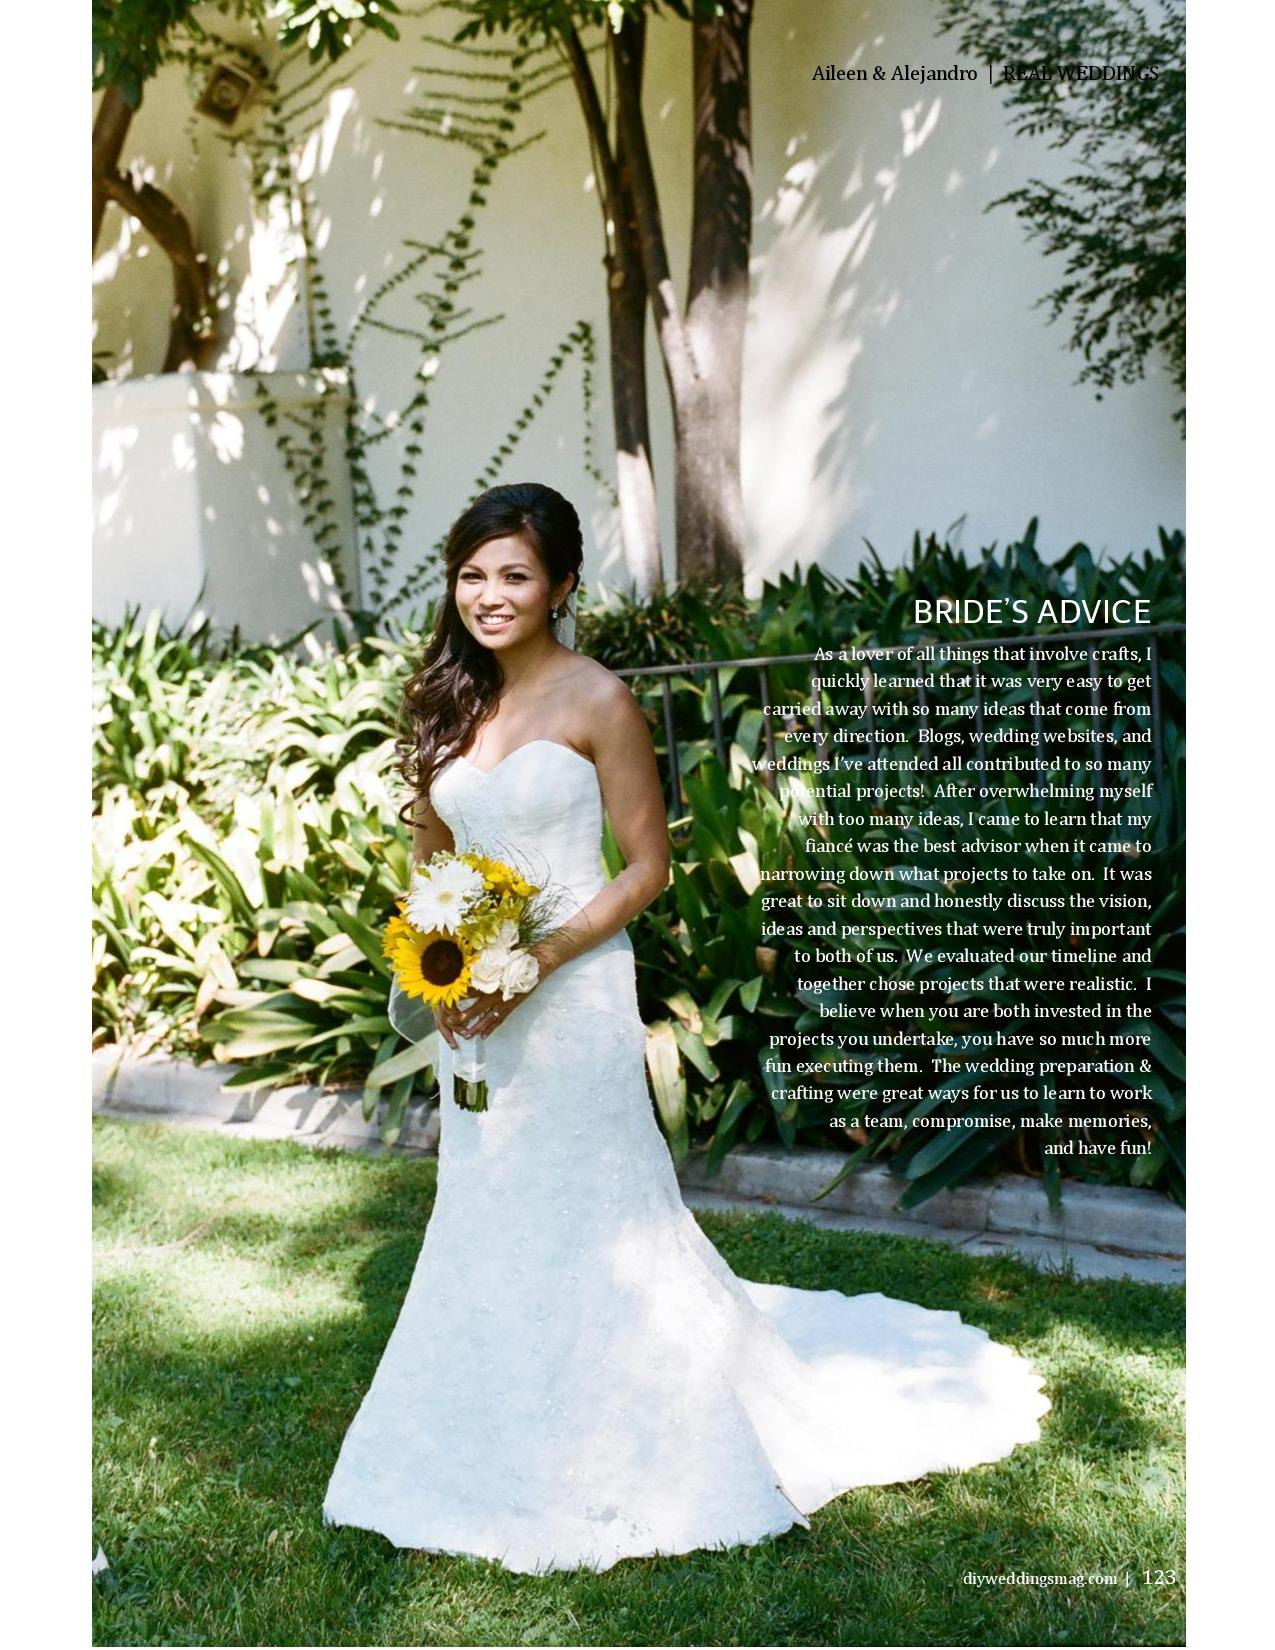 Aileen & Alejandro-DIY Weddings Mag-page-008.jpg